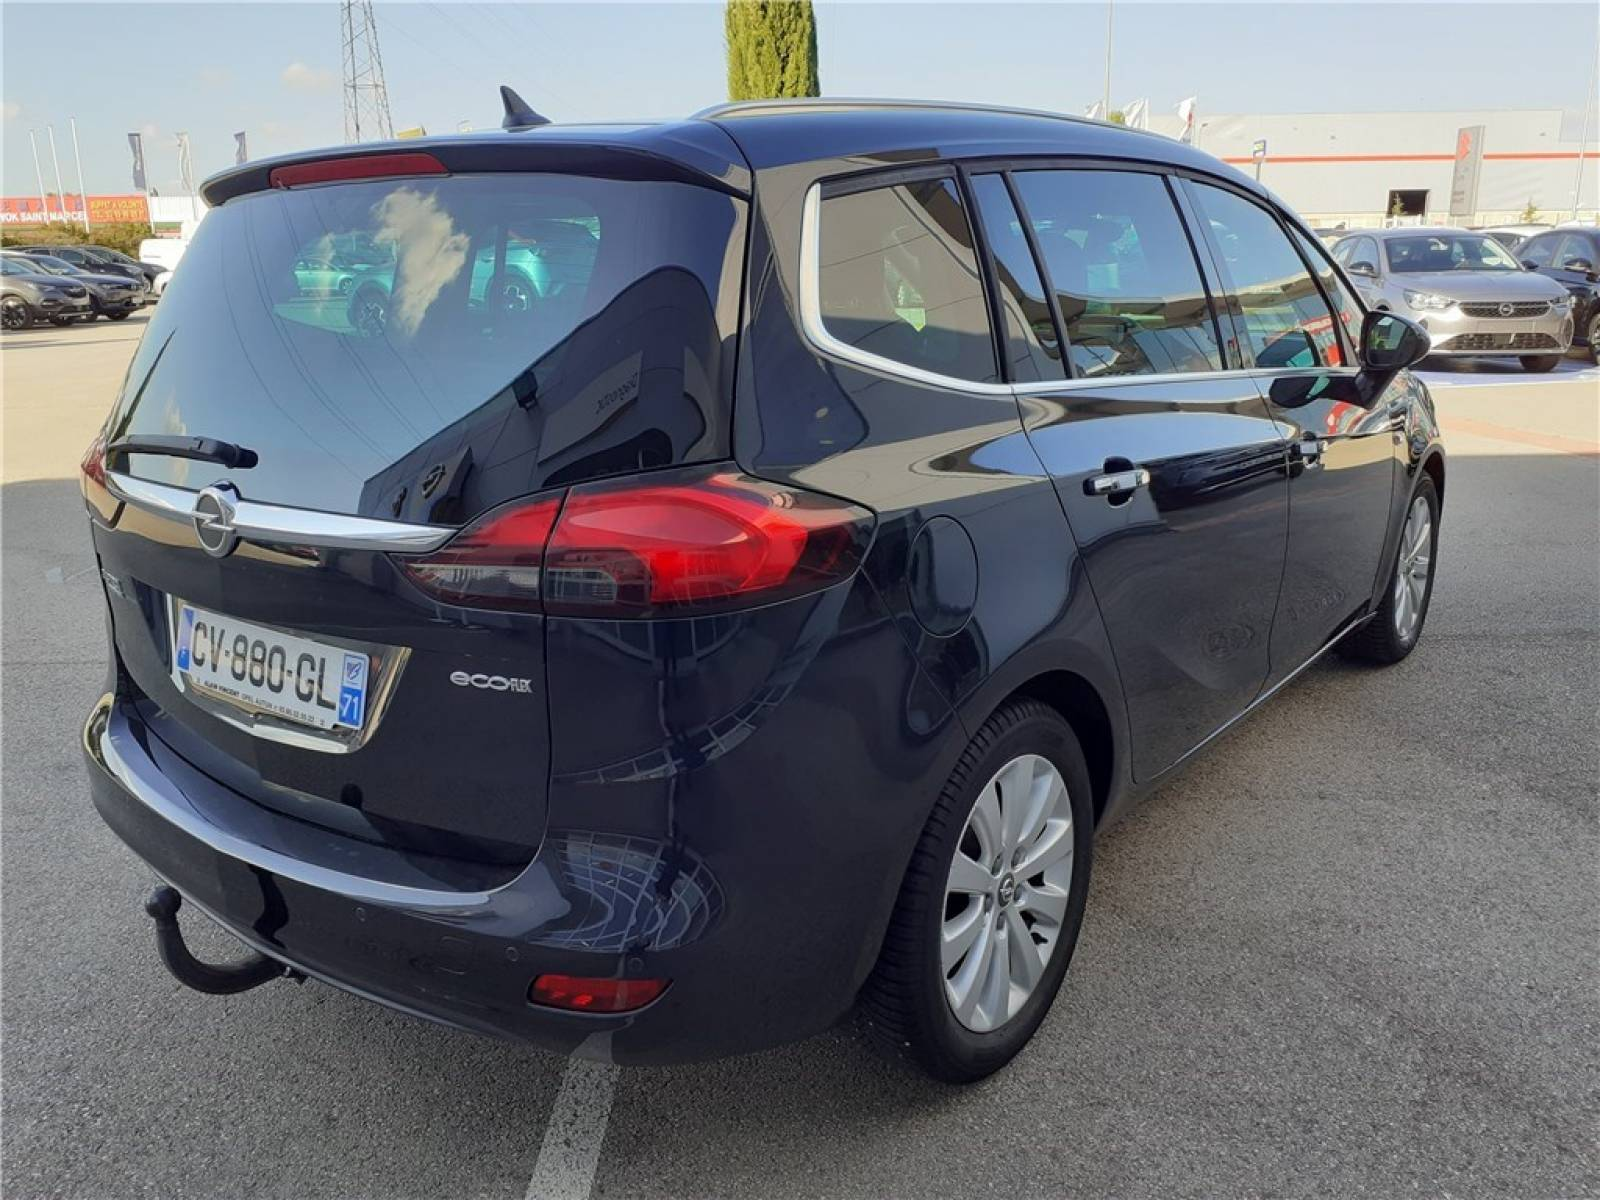 OPEL Zafira Tourer 1.4 Turbo 140 ch Start/Stop EcoFlex - véhicule d'occasion - Groupe Guillet - Opel Magicauto - Chalon-sur-Saône - 71380 - Saint-Marcel - 3